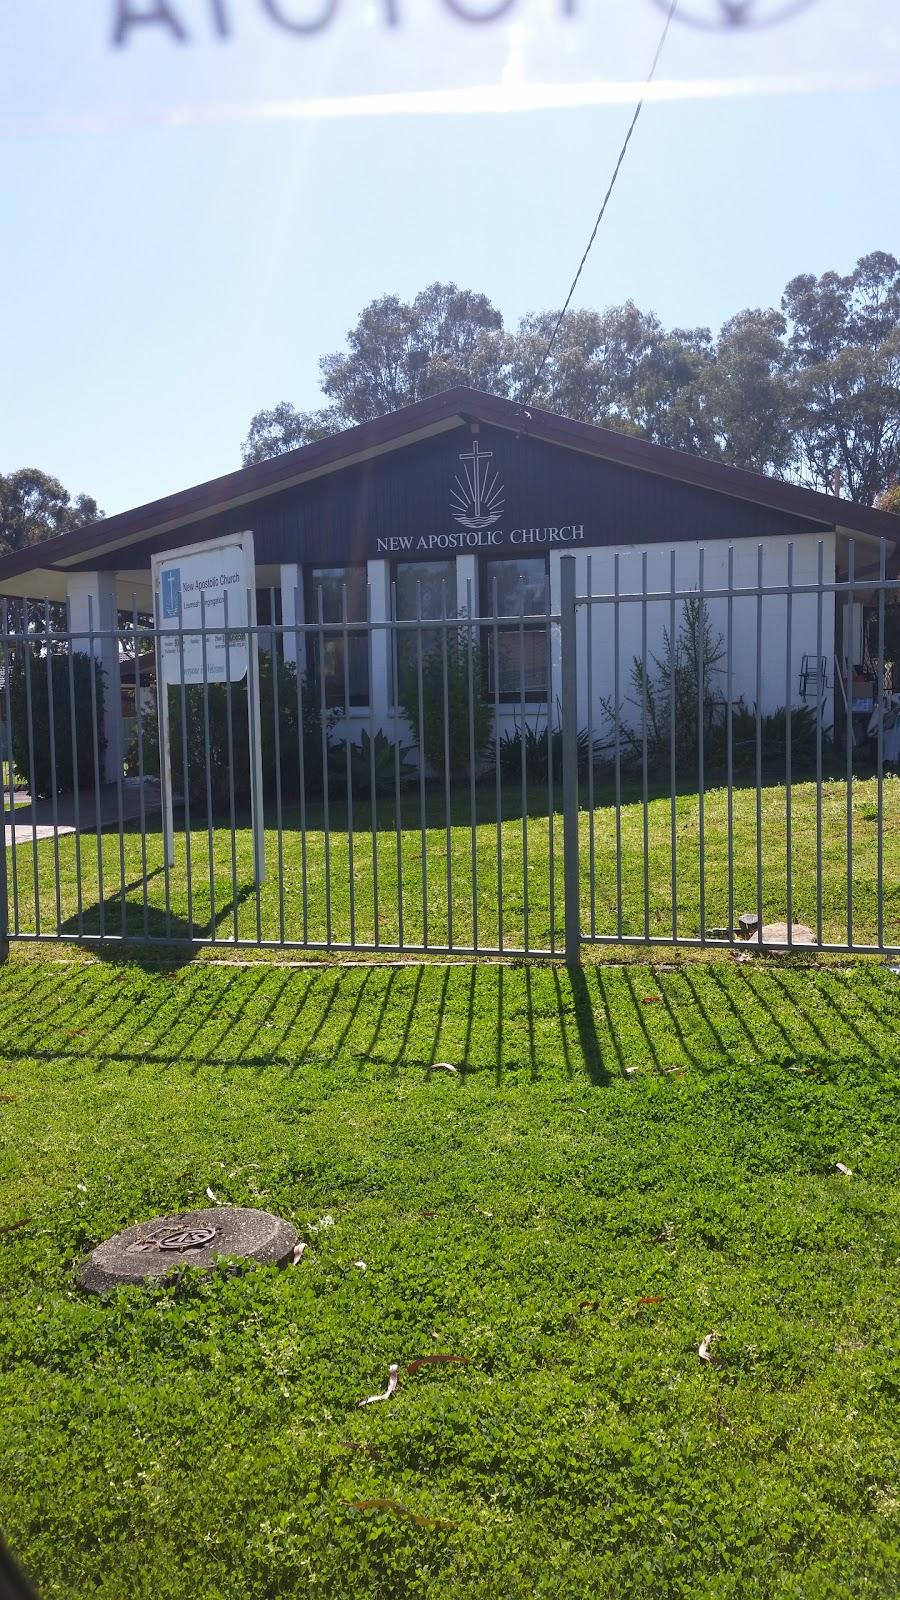 New Apostolic Church Leumeah | 18 Kingsclare St, Leumeah NSW 2560